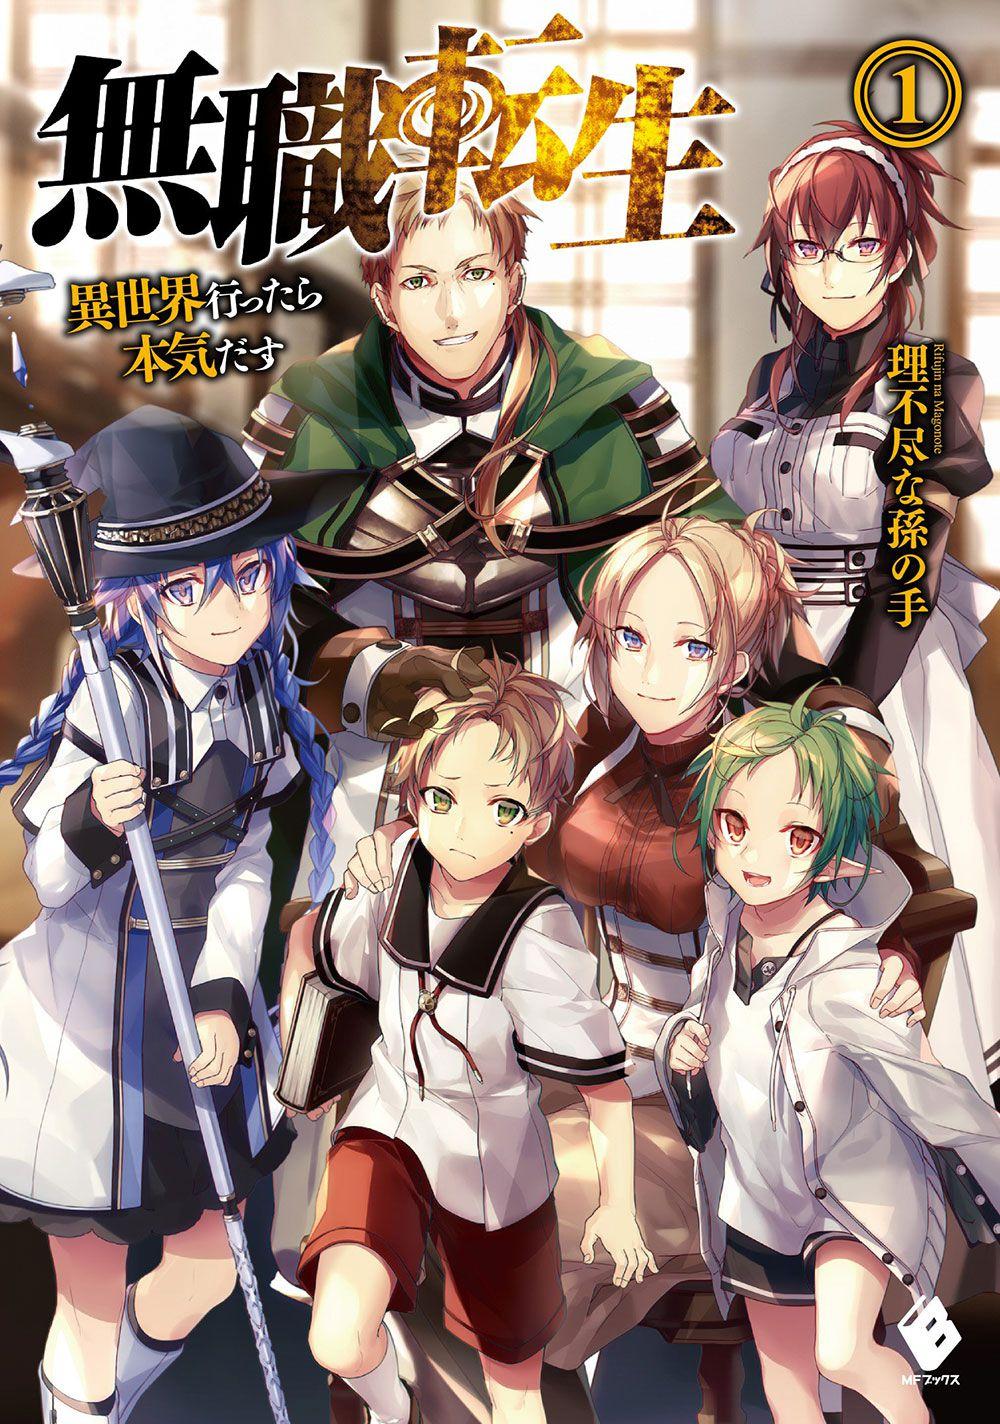 Mushoku-Tensei-Isekai-Ittara-Honki-Dasu-Vol-1-Cover